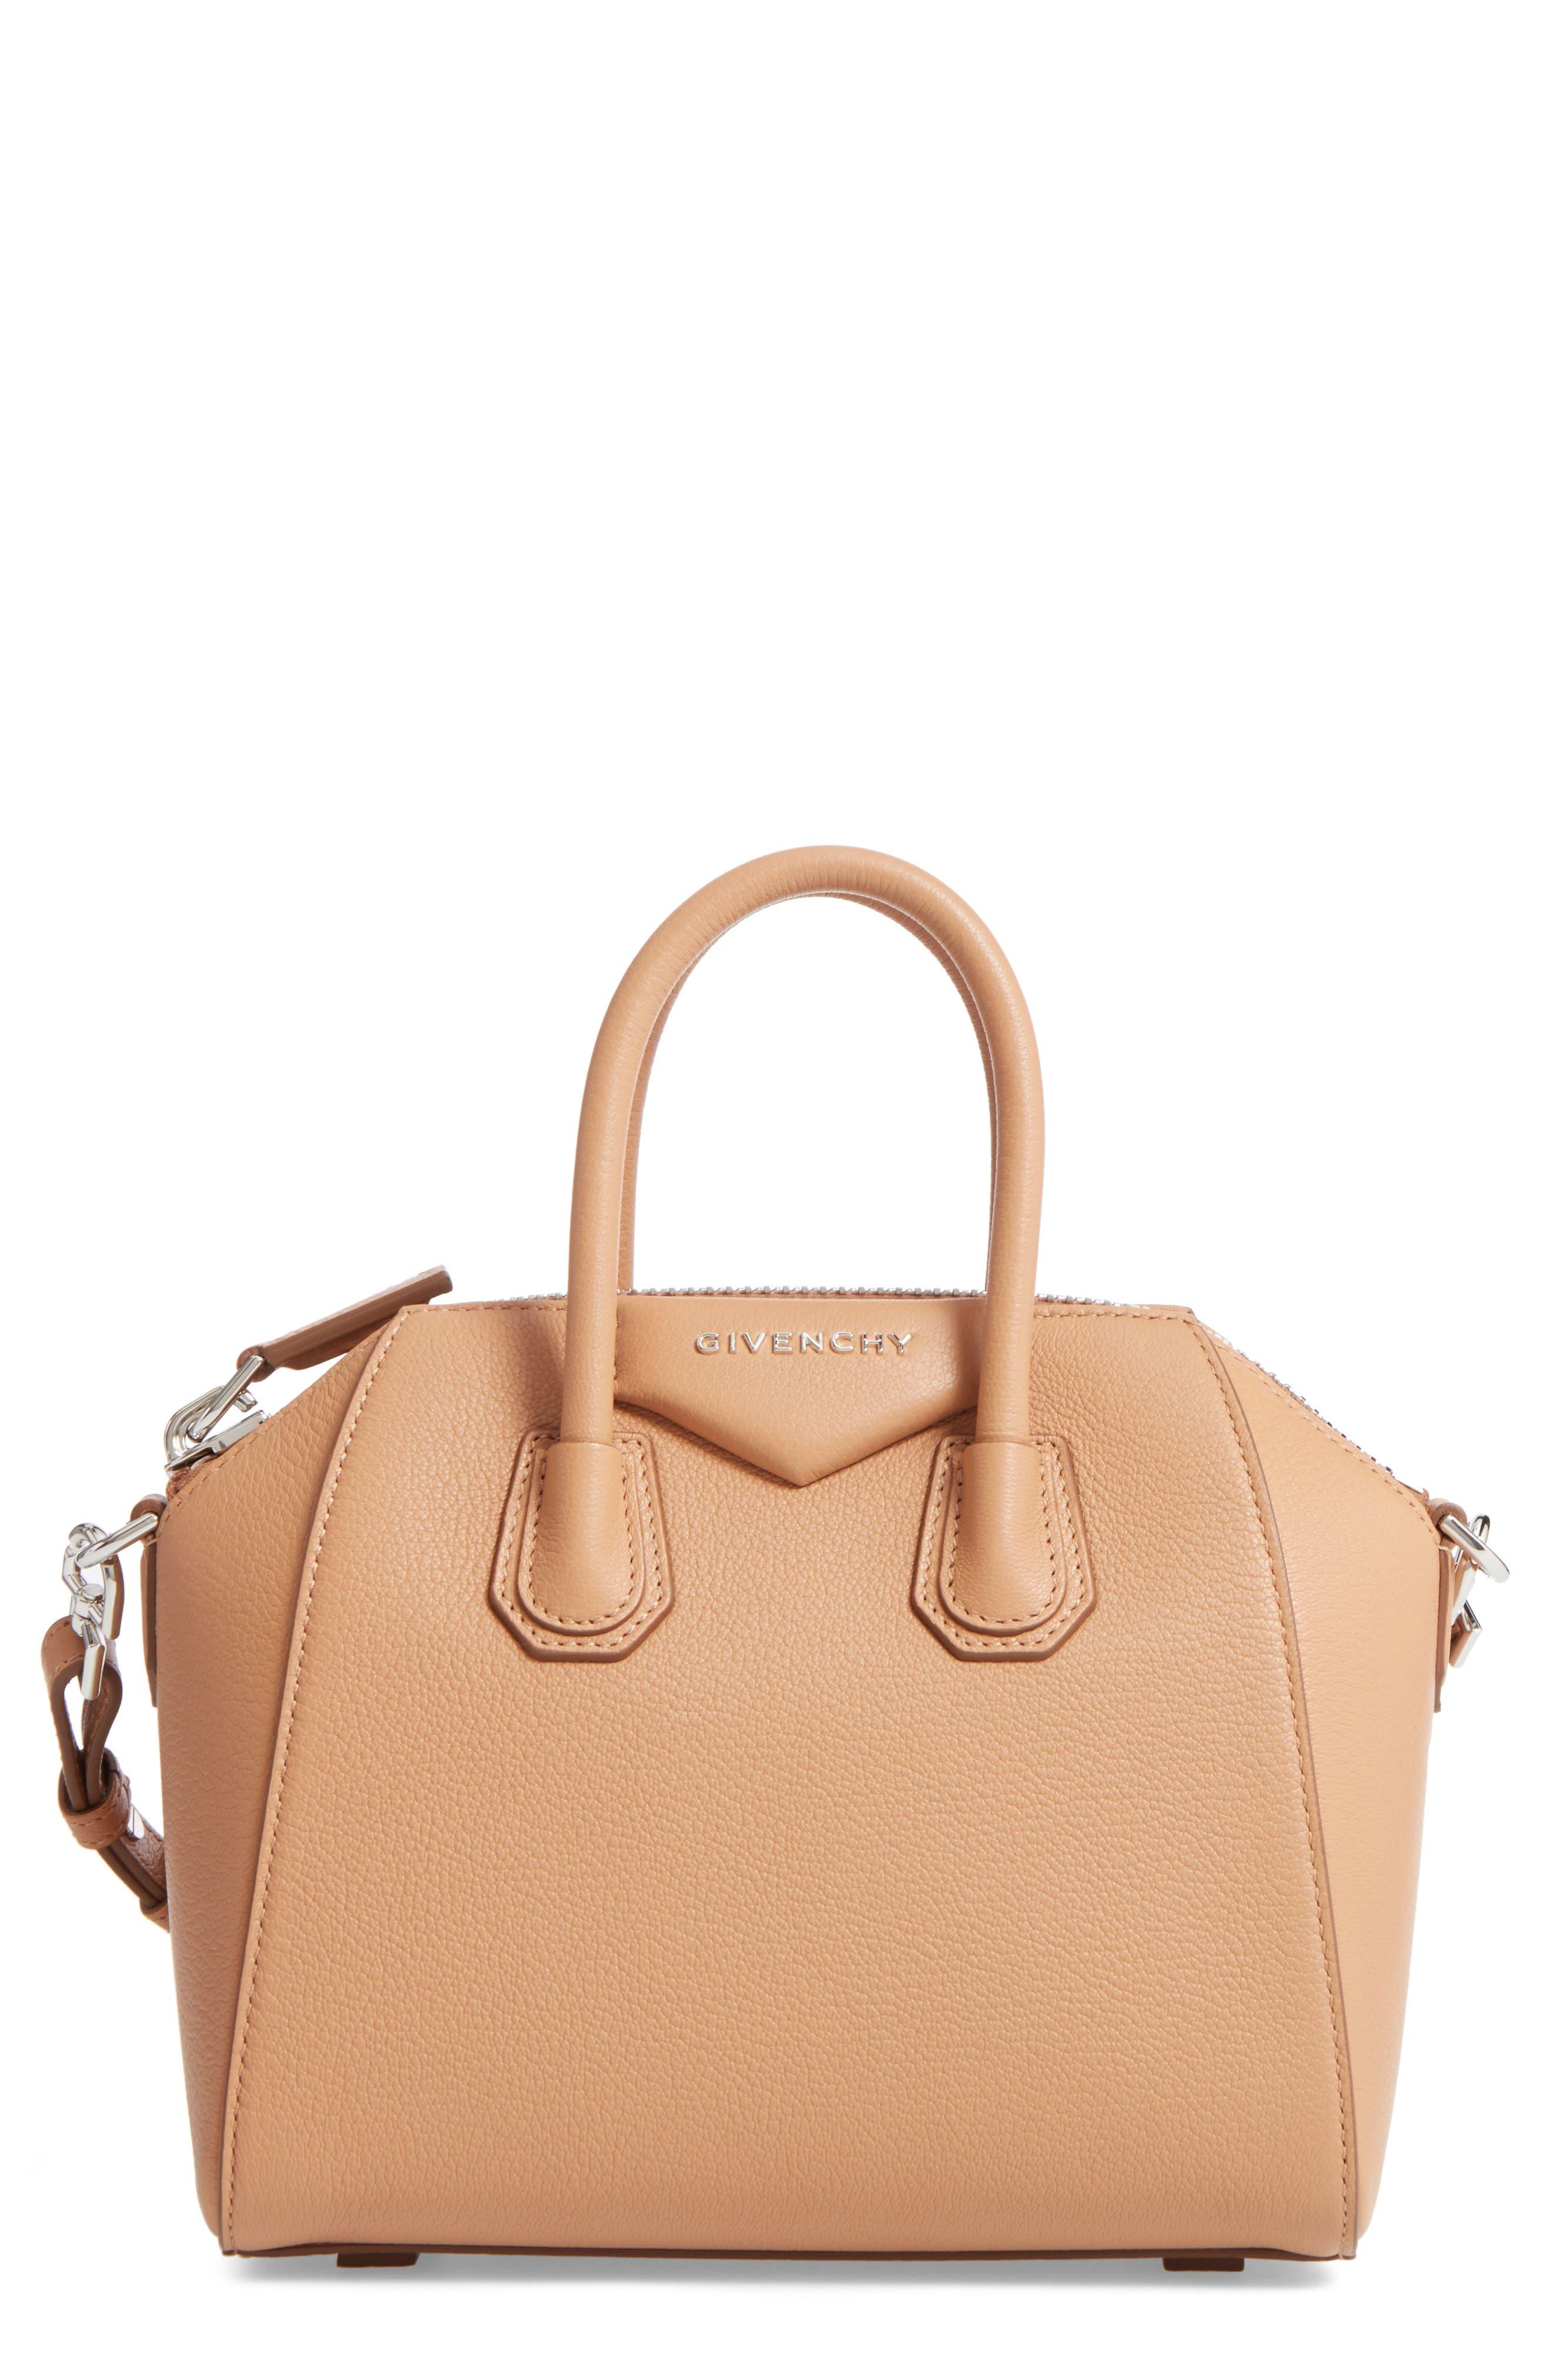 Main Image - Givenchy 'Mini Antigona' Sugar Leather Satchel